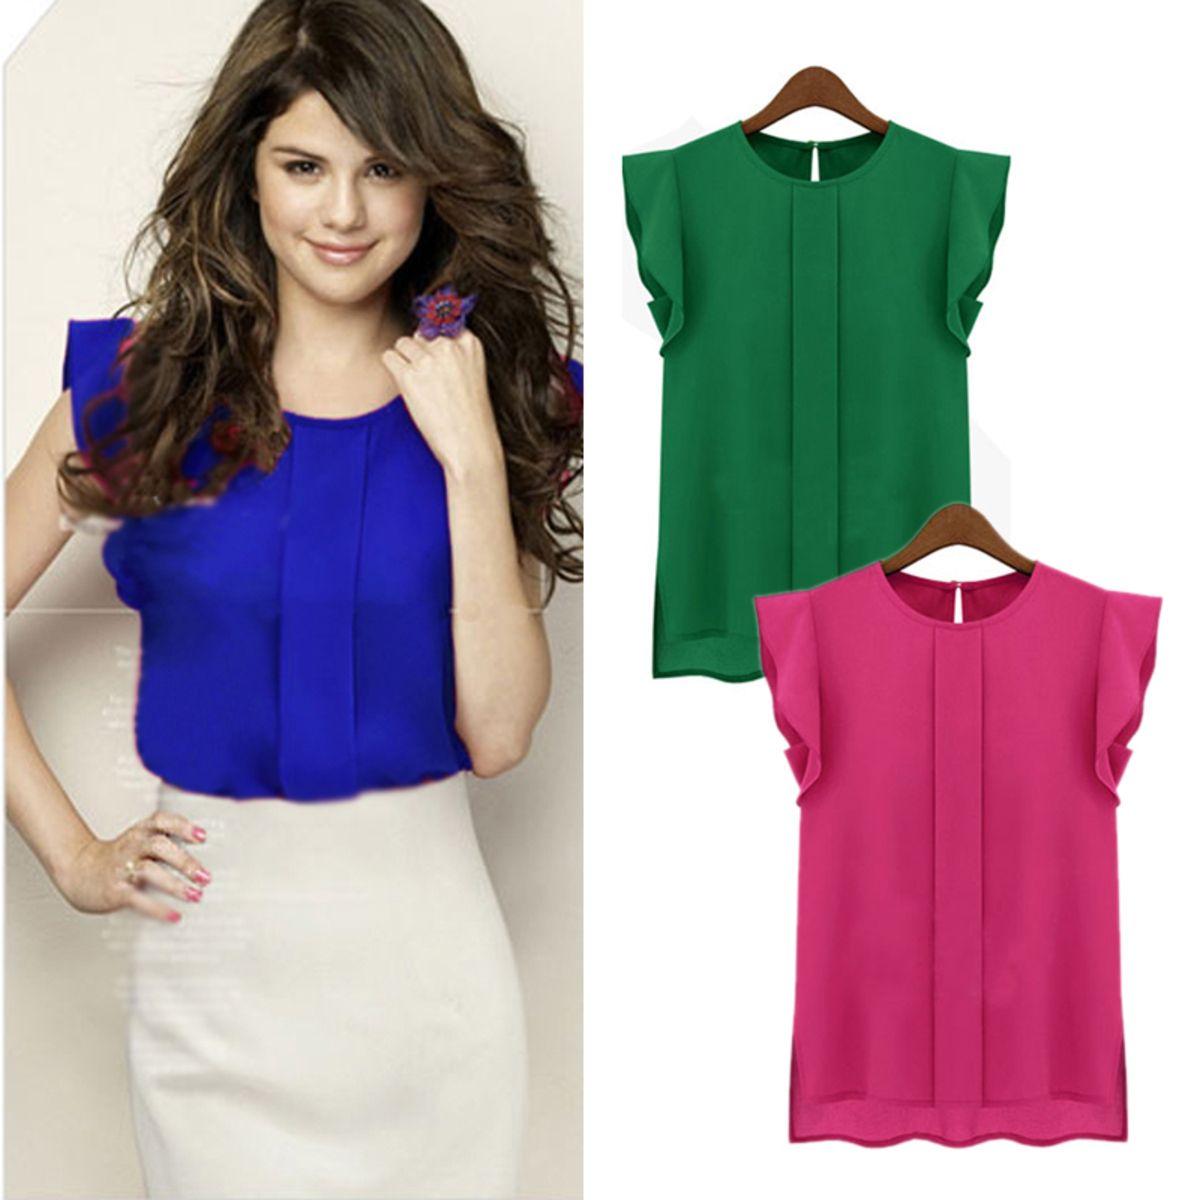 f9a9d404d Comprar roupas femininas online